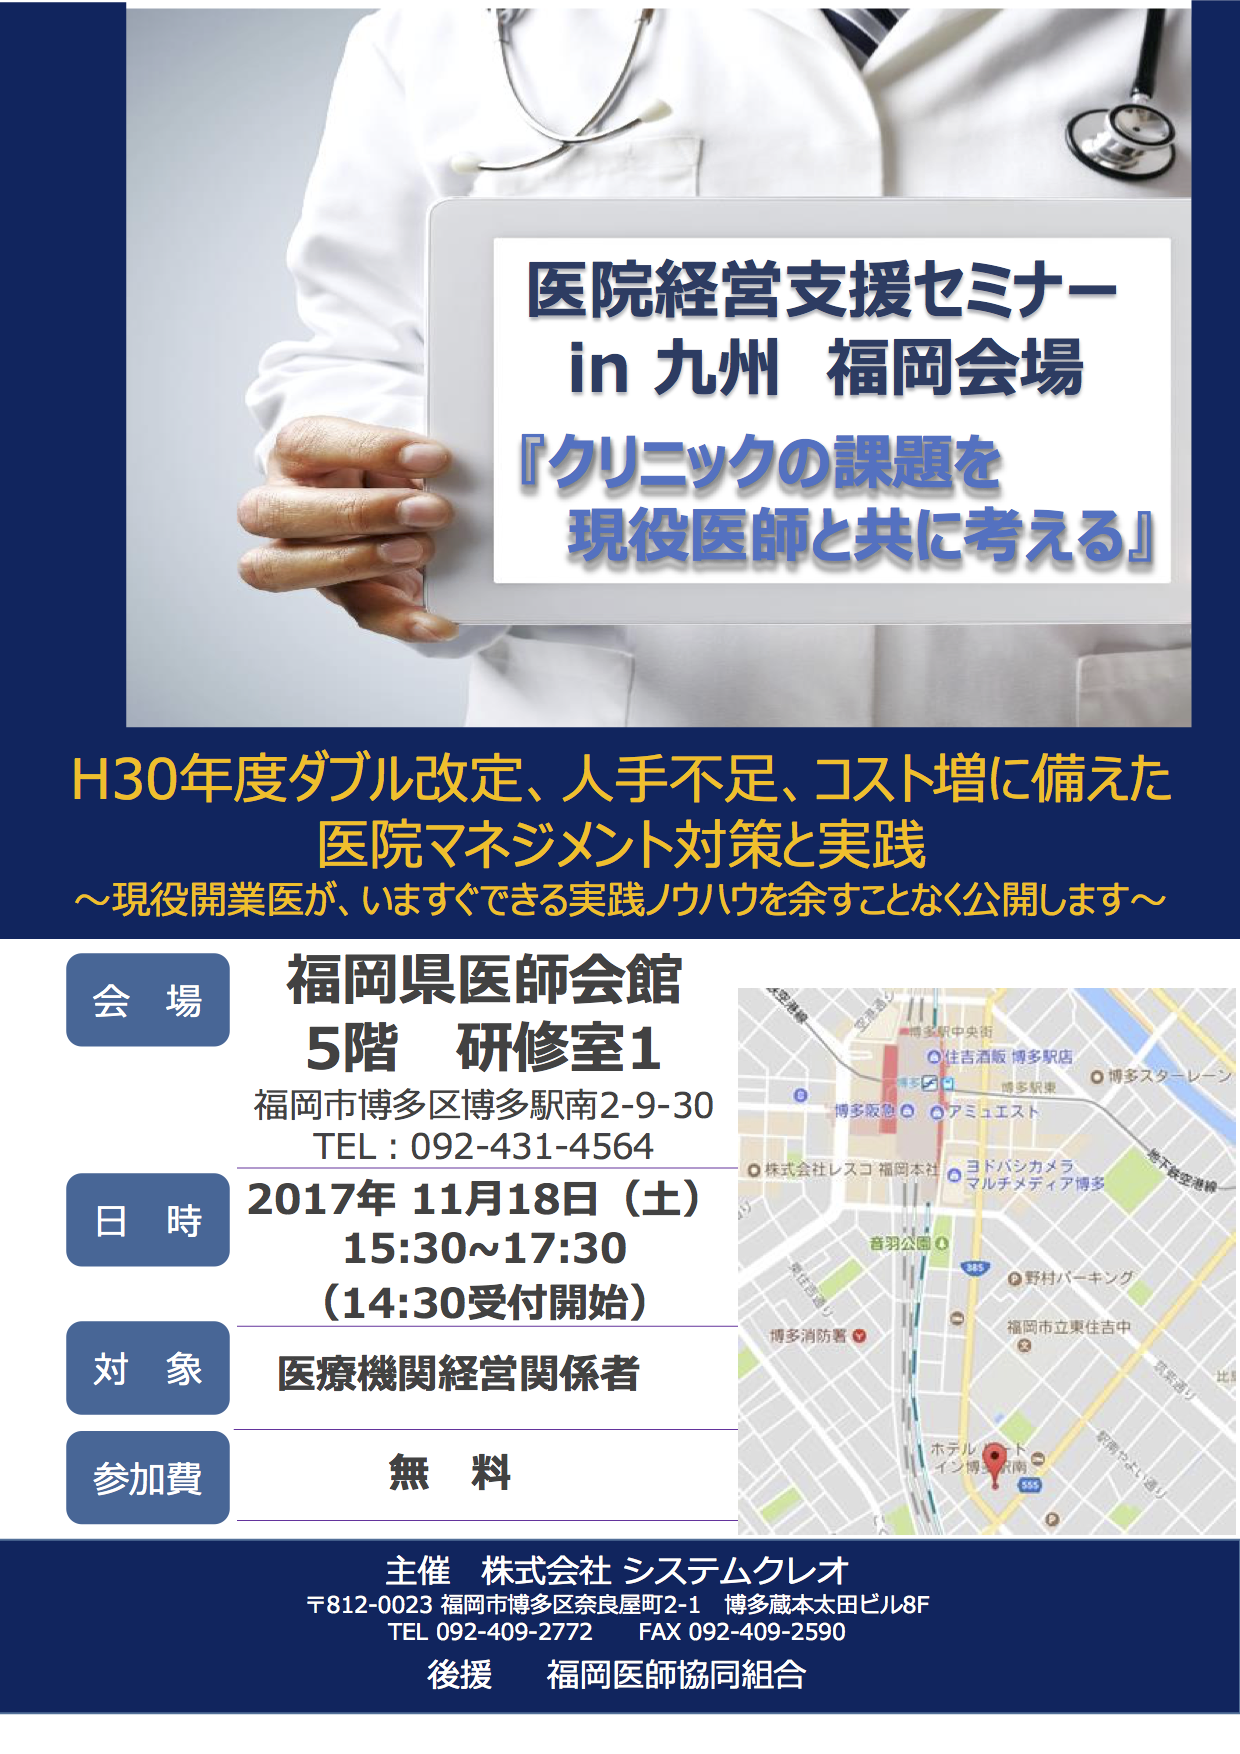 seminar_fukuoka-1